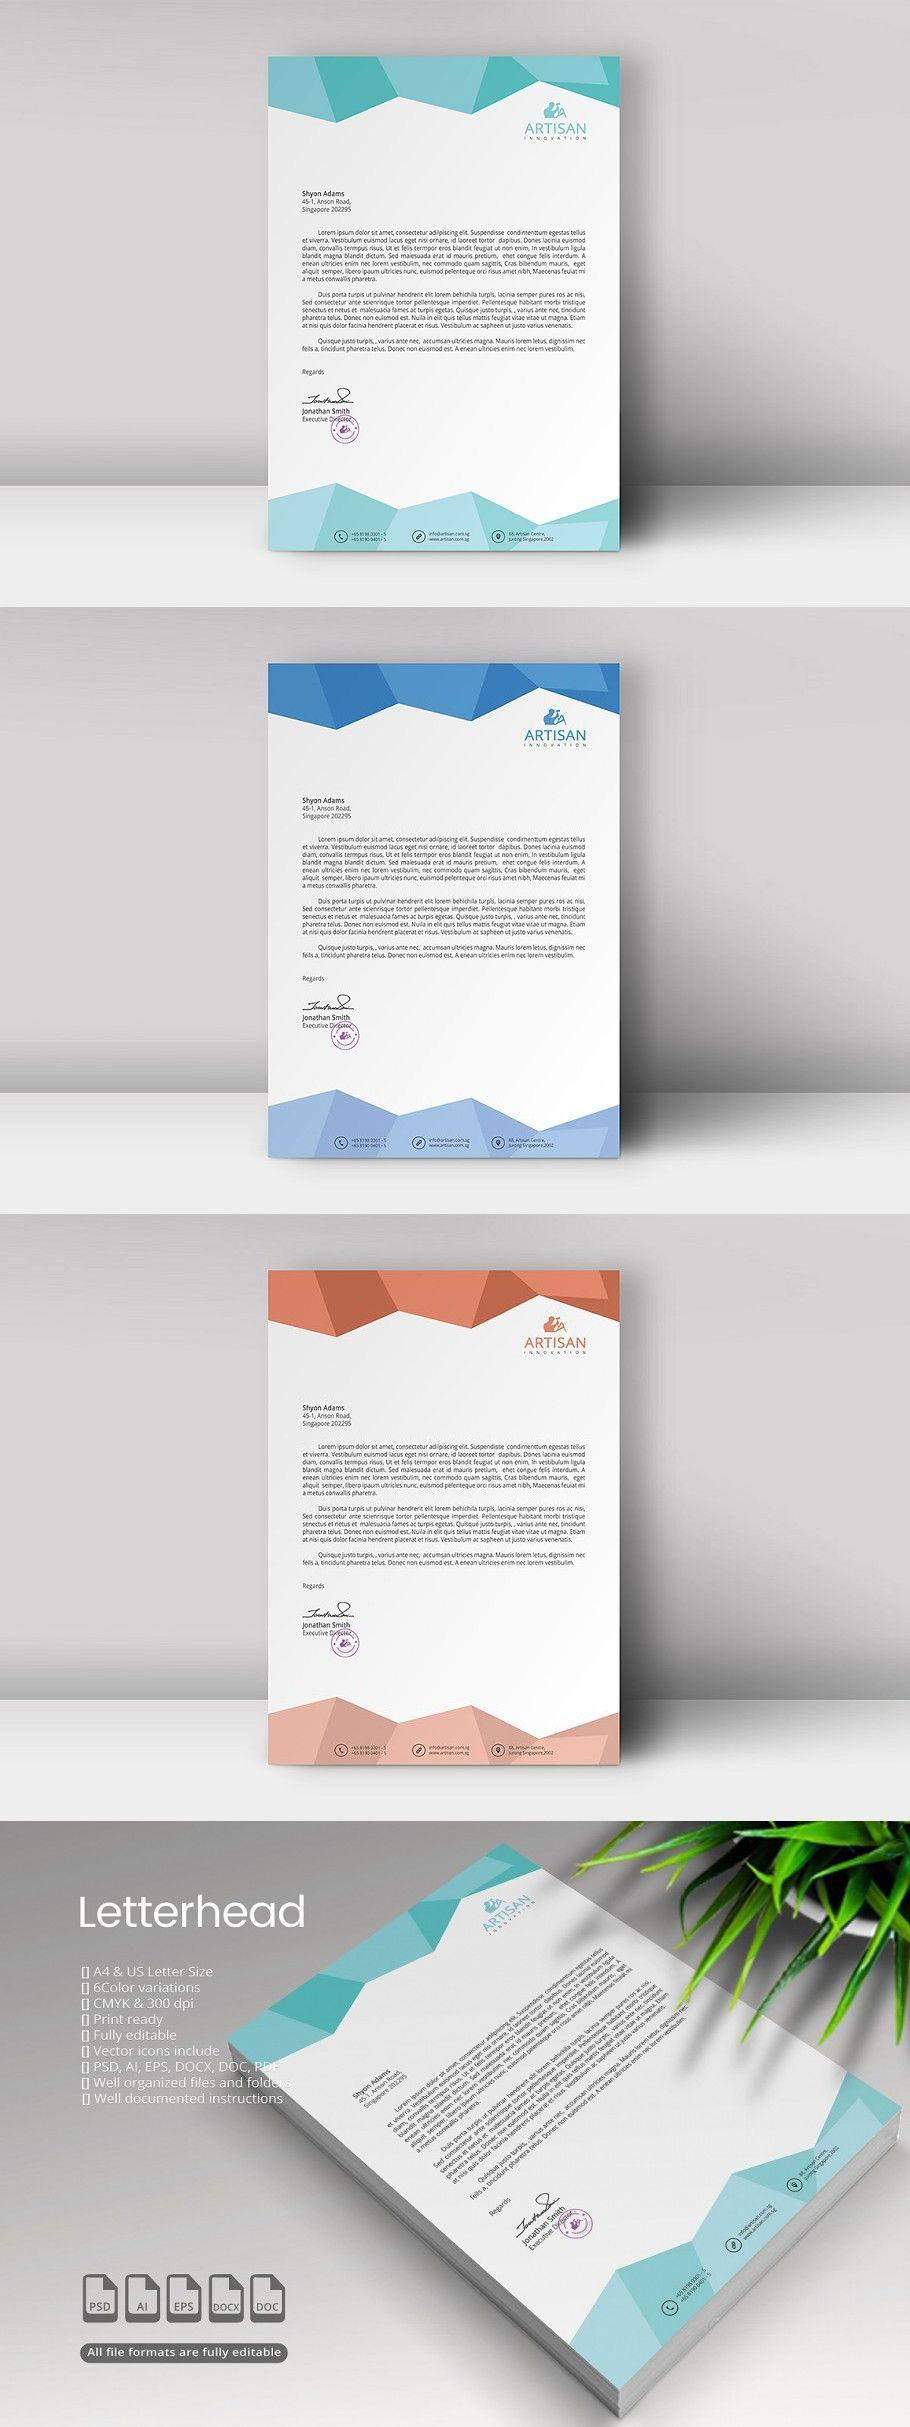 Letterhead Presentation Folder Design Presentation Folder Letterhead